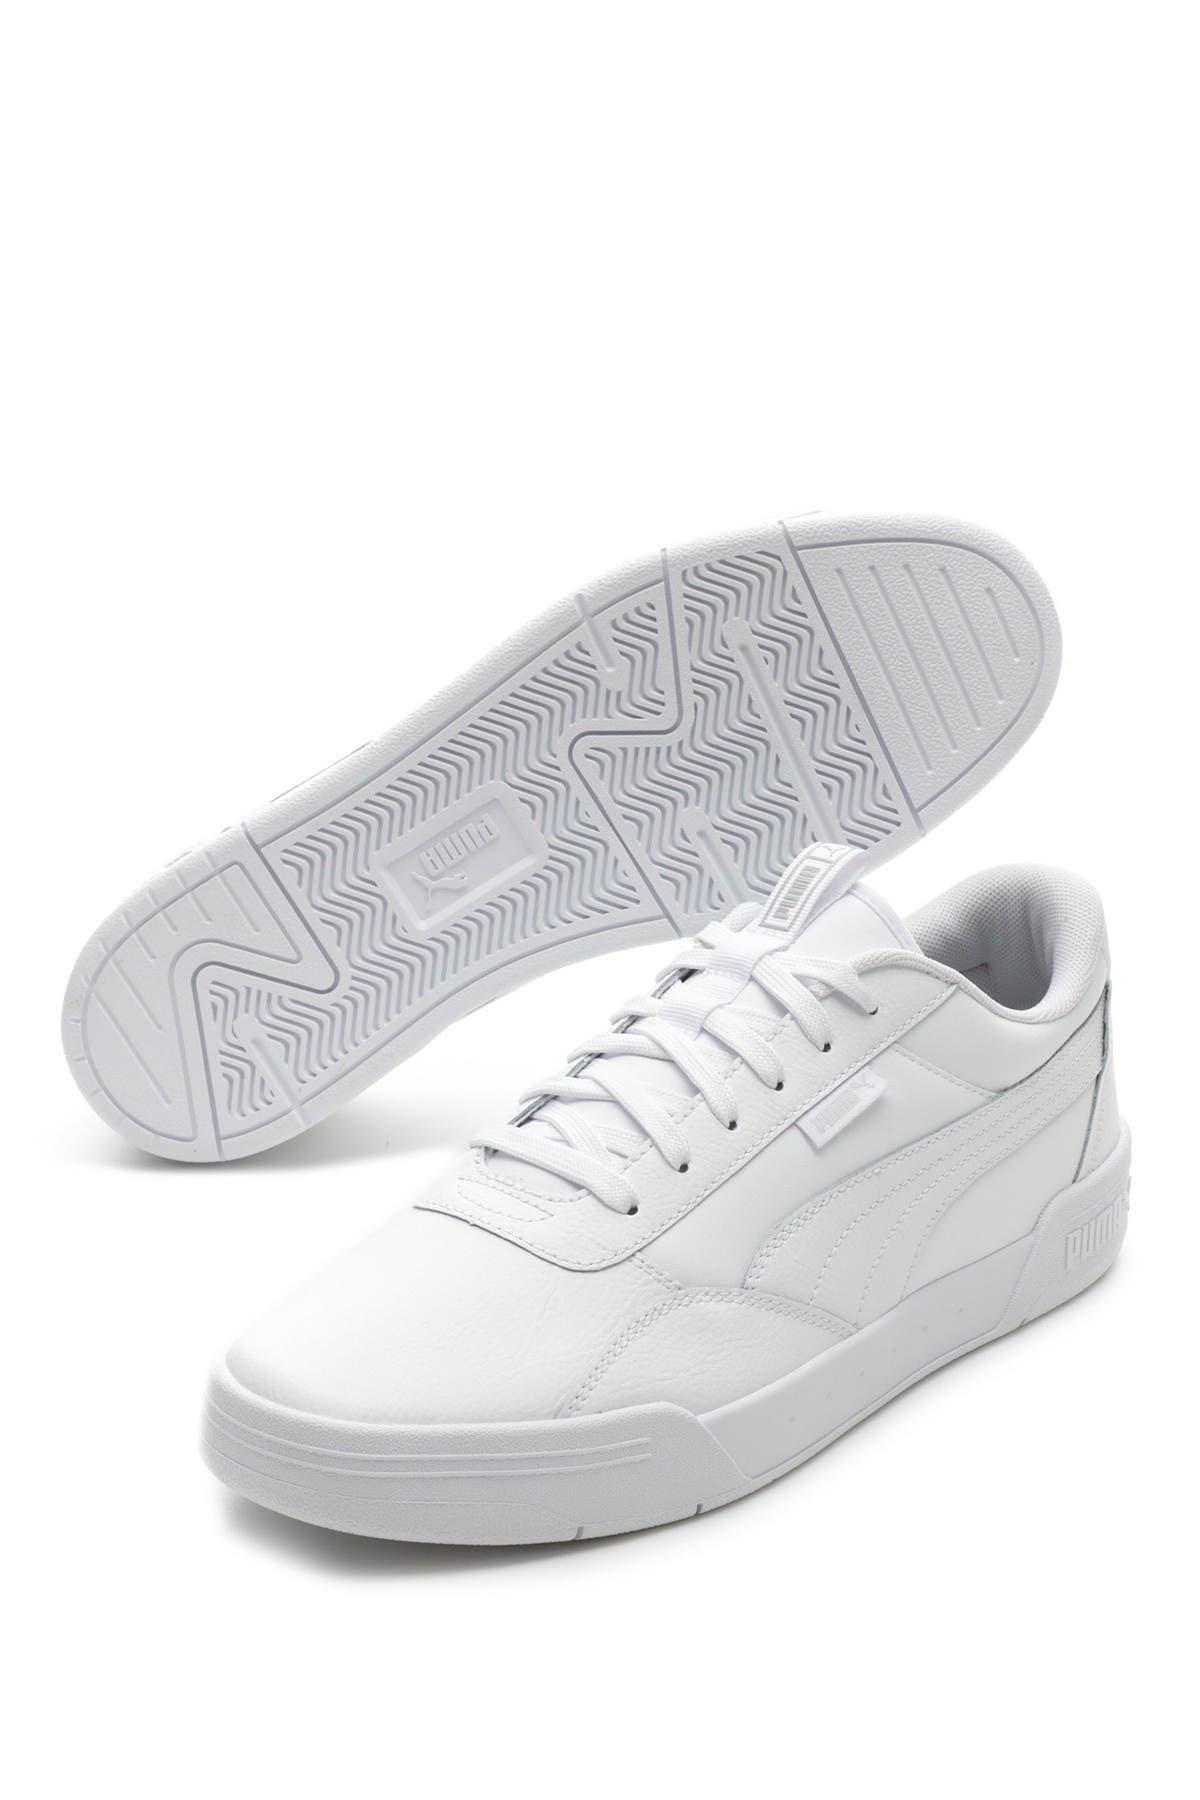 PUMA | C-Skate Sneaker | Nordstrom Rack